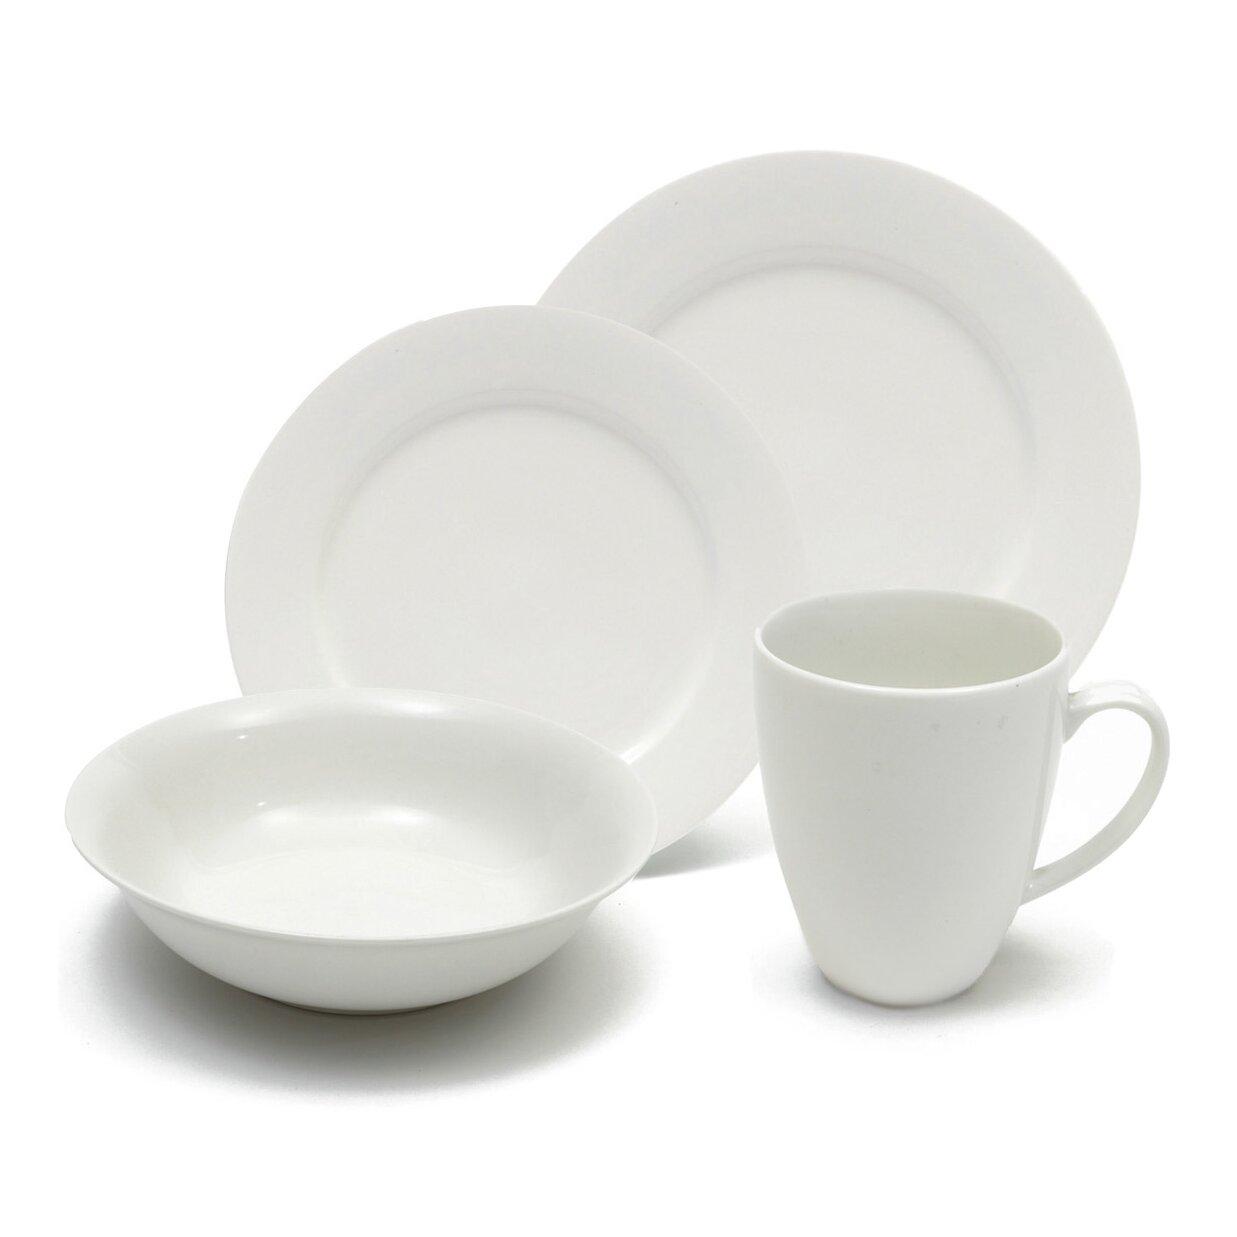 Maxwell amp williams white basics providence 16 piece dinnerware set